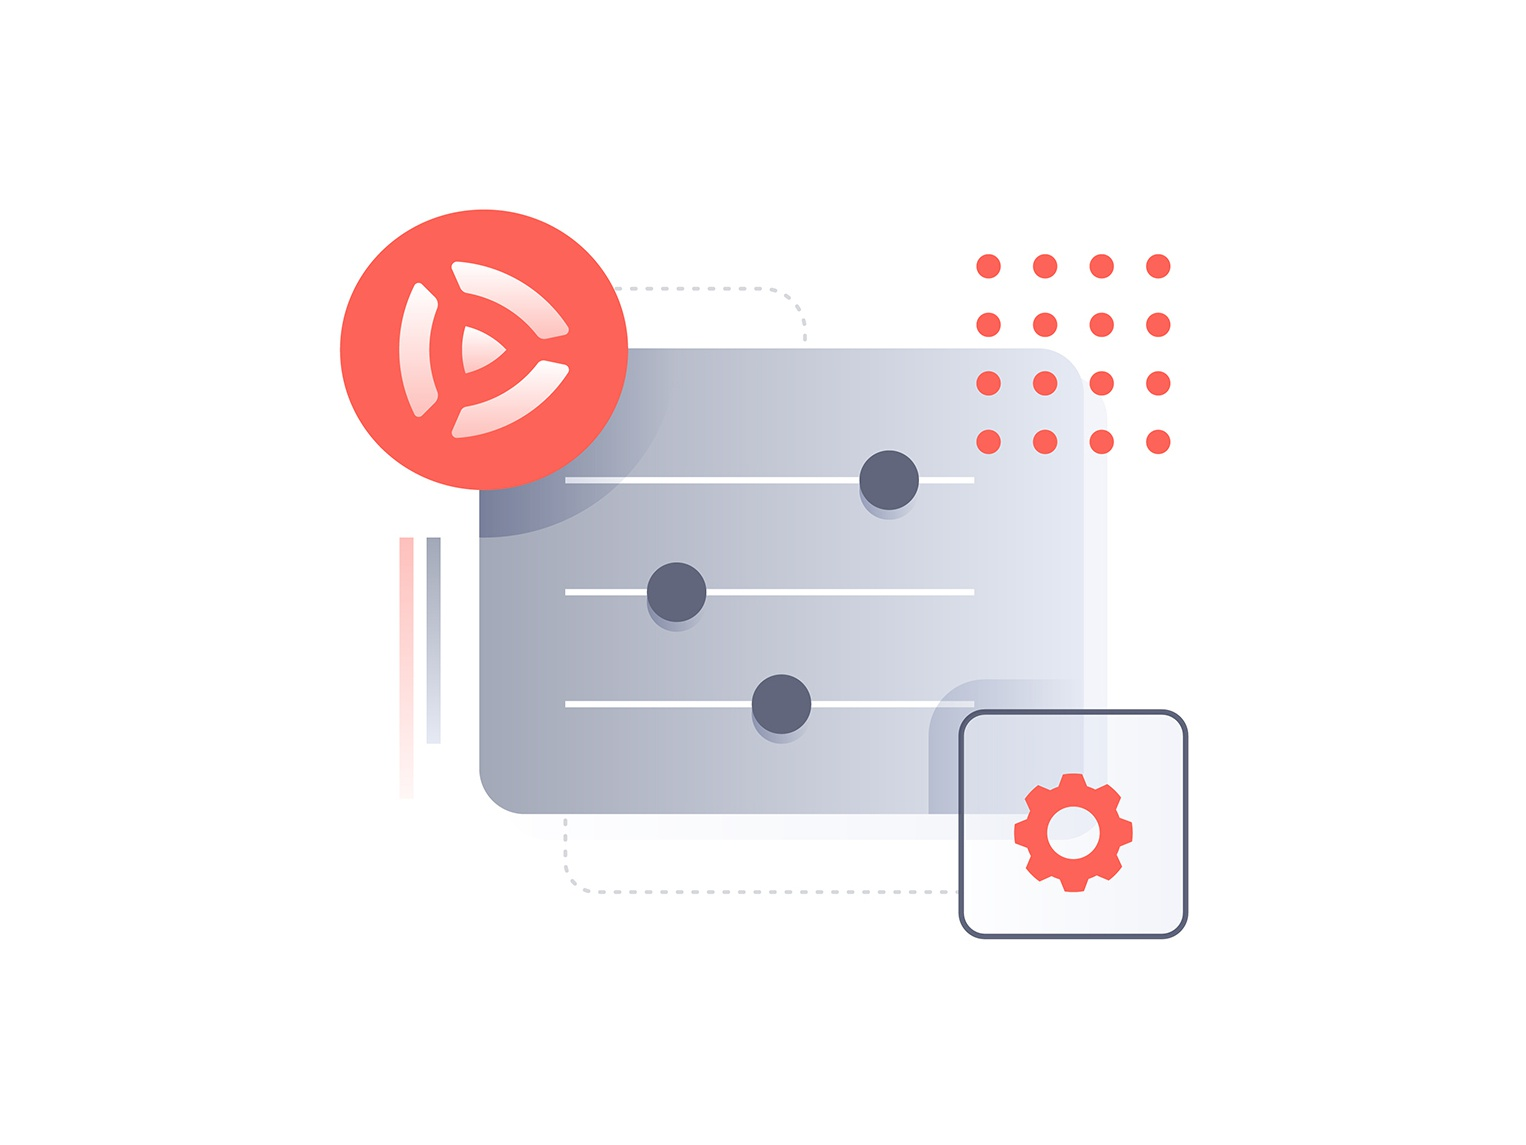 Settings ui tech video settings iconography vector design icon minimal illustration